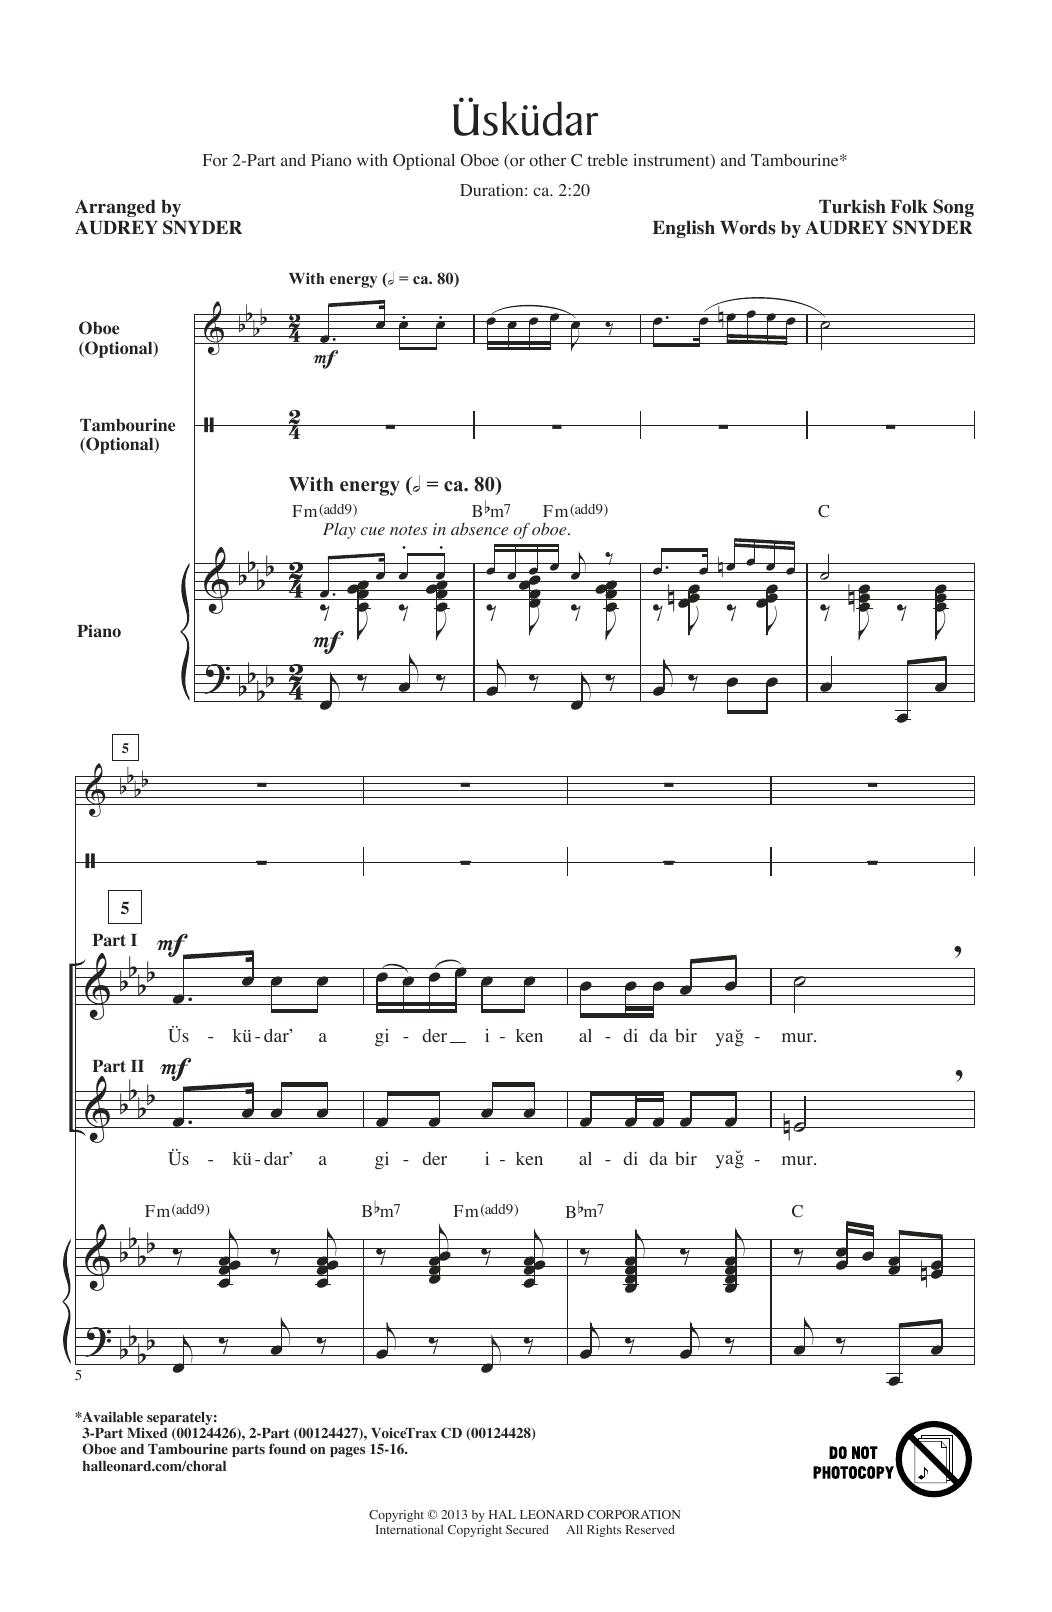 Turkish Folksong Uskudar (arr. Audrey Snyder) sheet music notes and chords. Download Printable PDF.